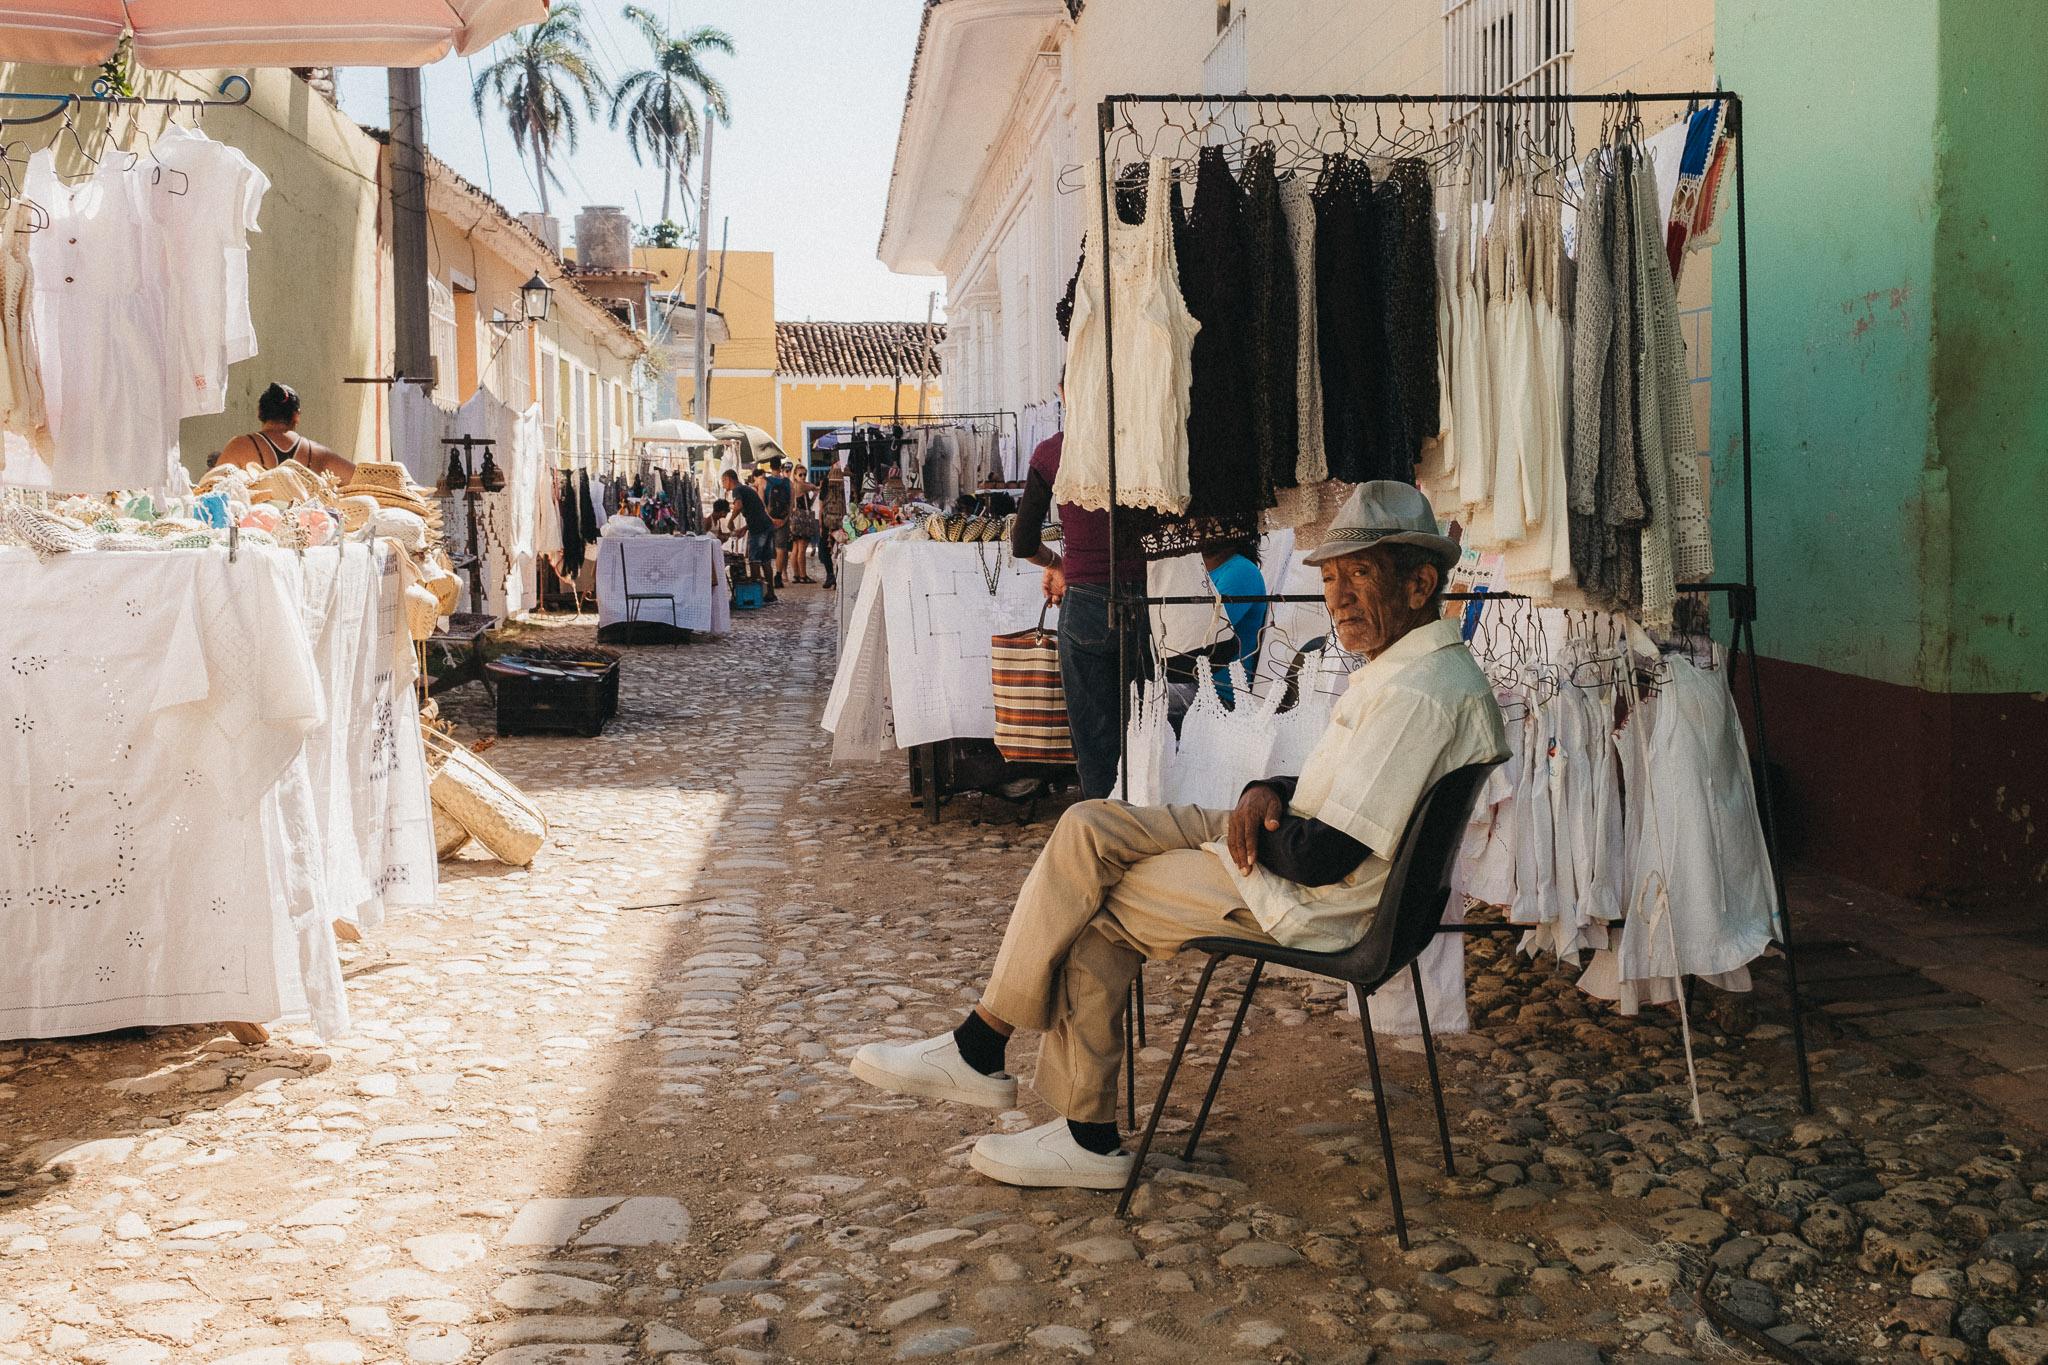 Cuba-2017-12-Trinidad-0049.jpg